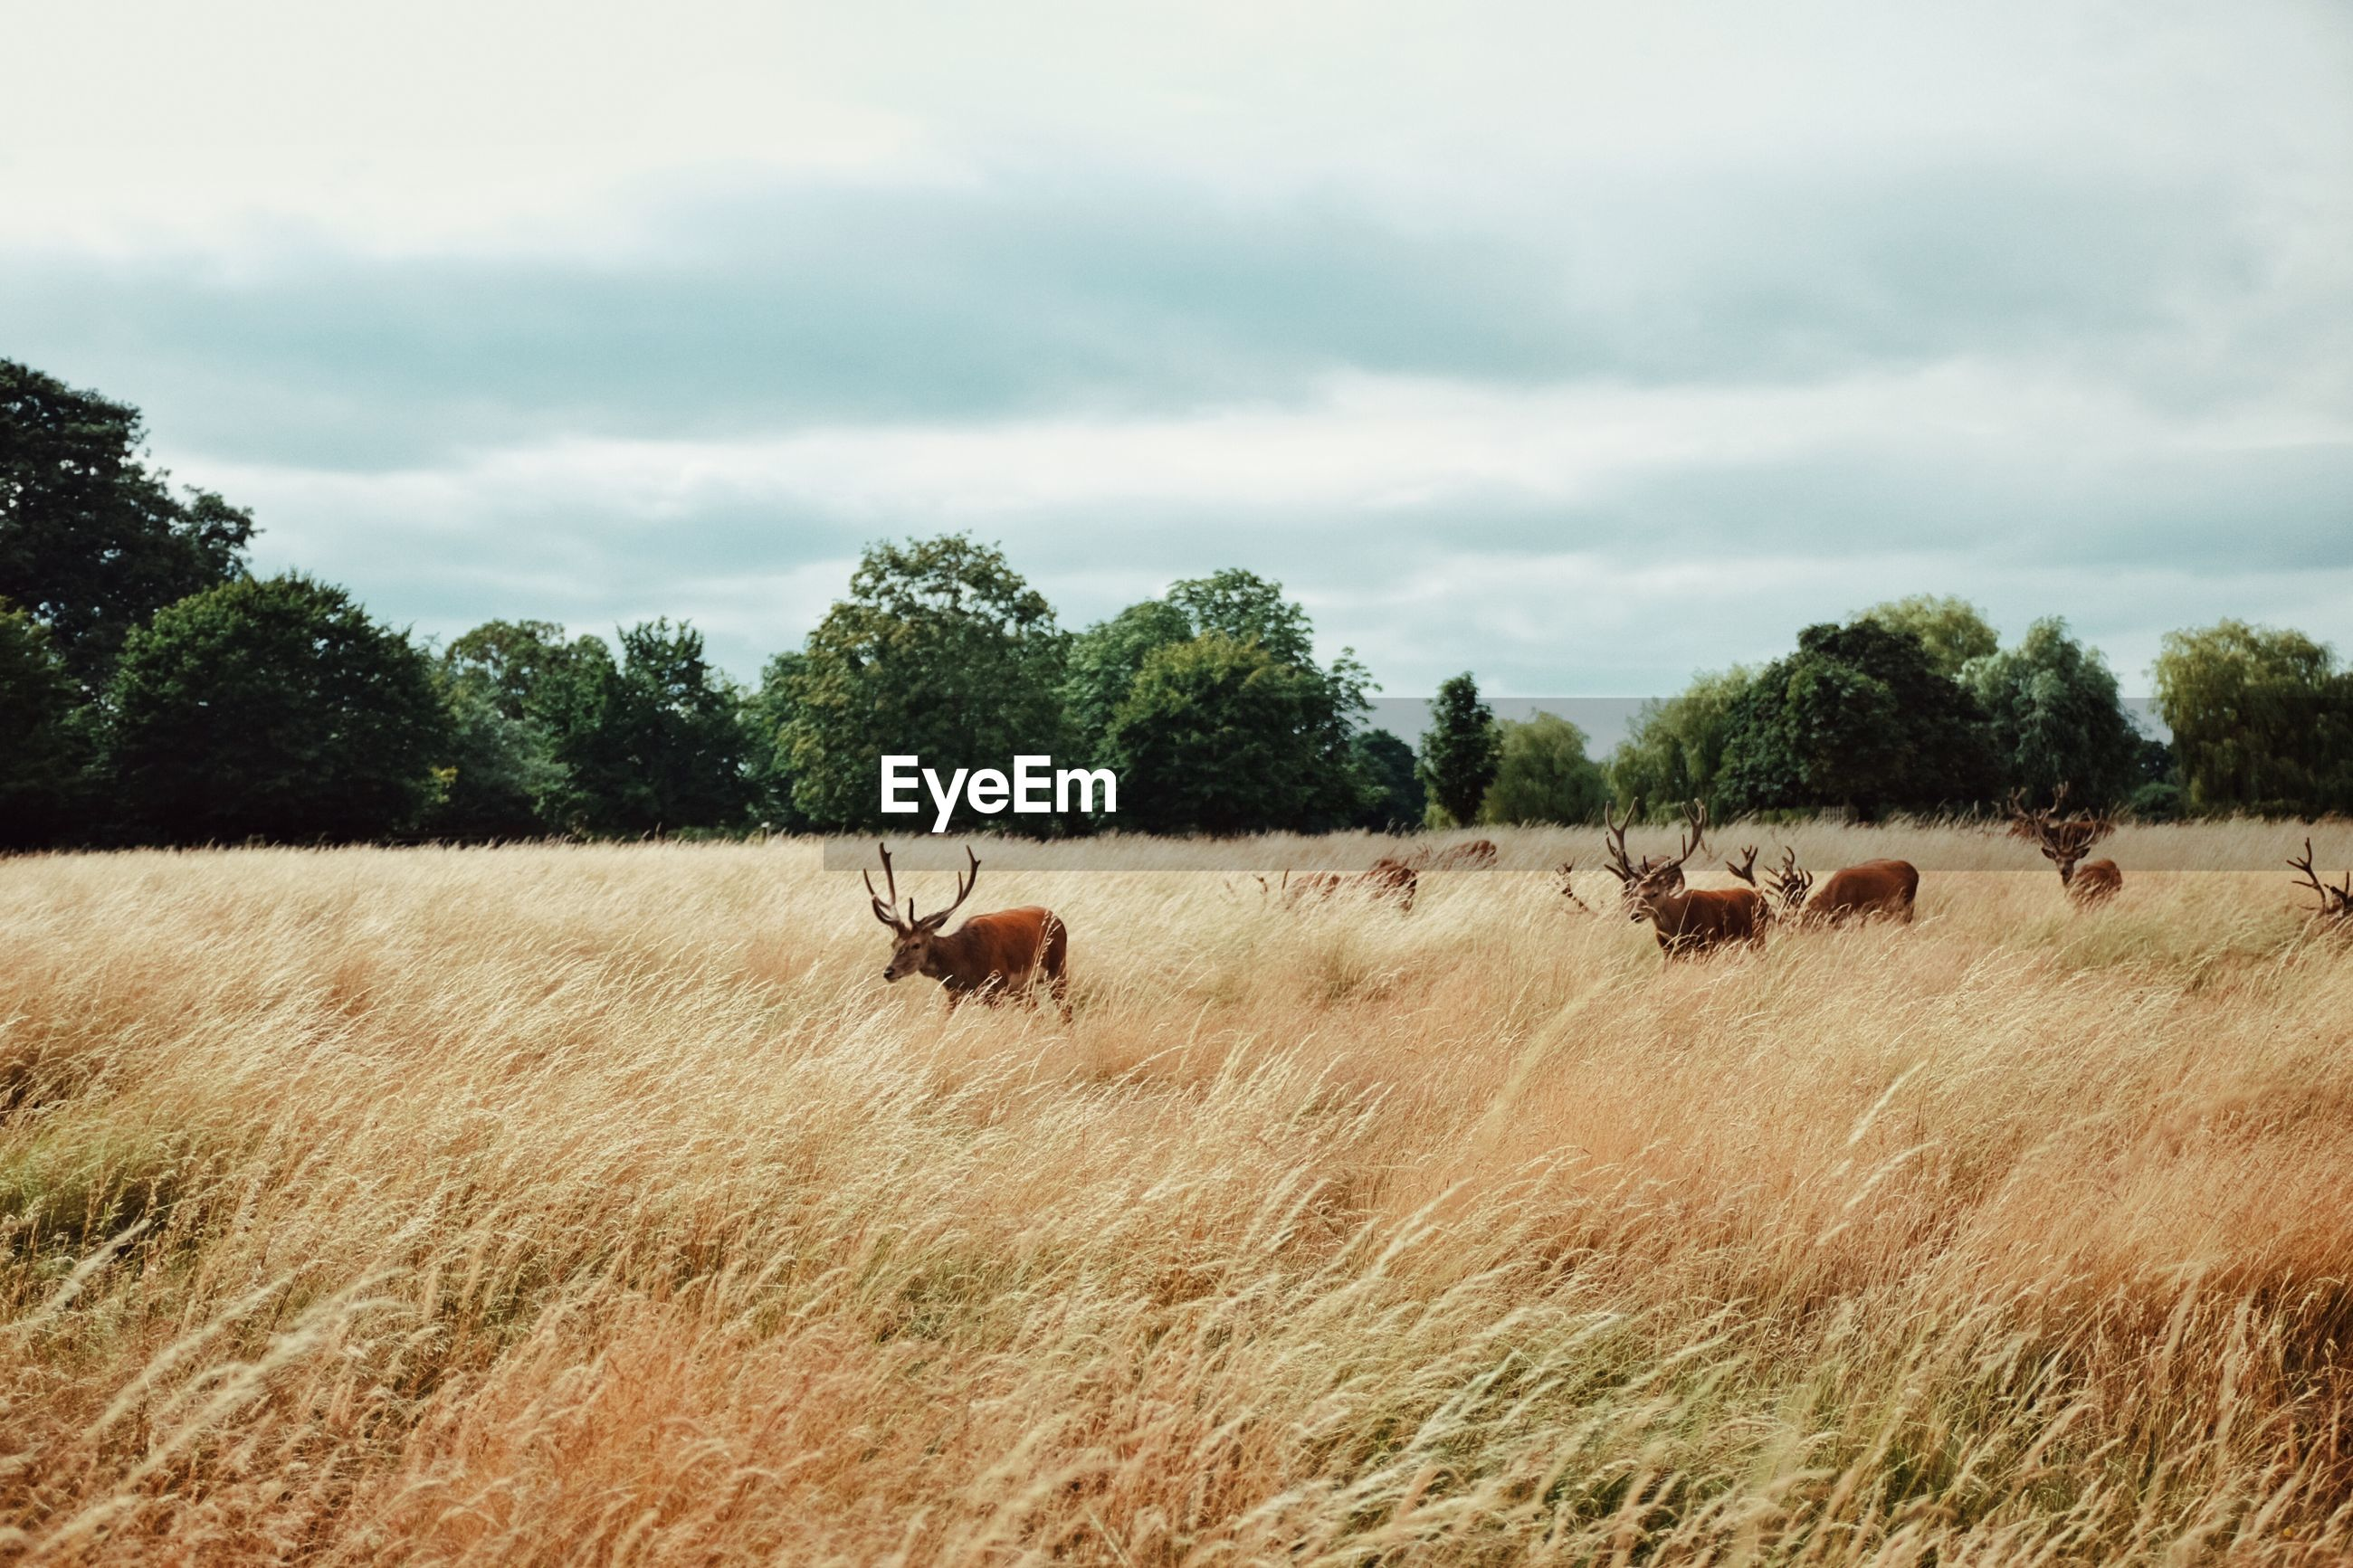 Deer on grassy field at bushy park against cloudy sky